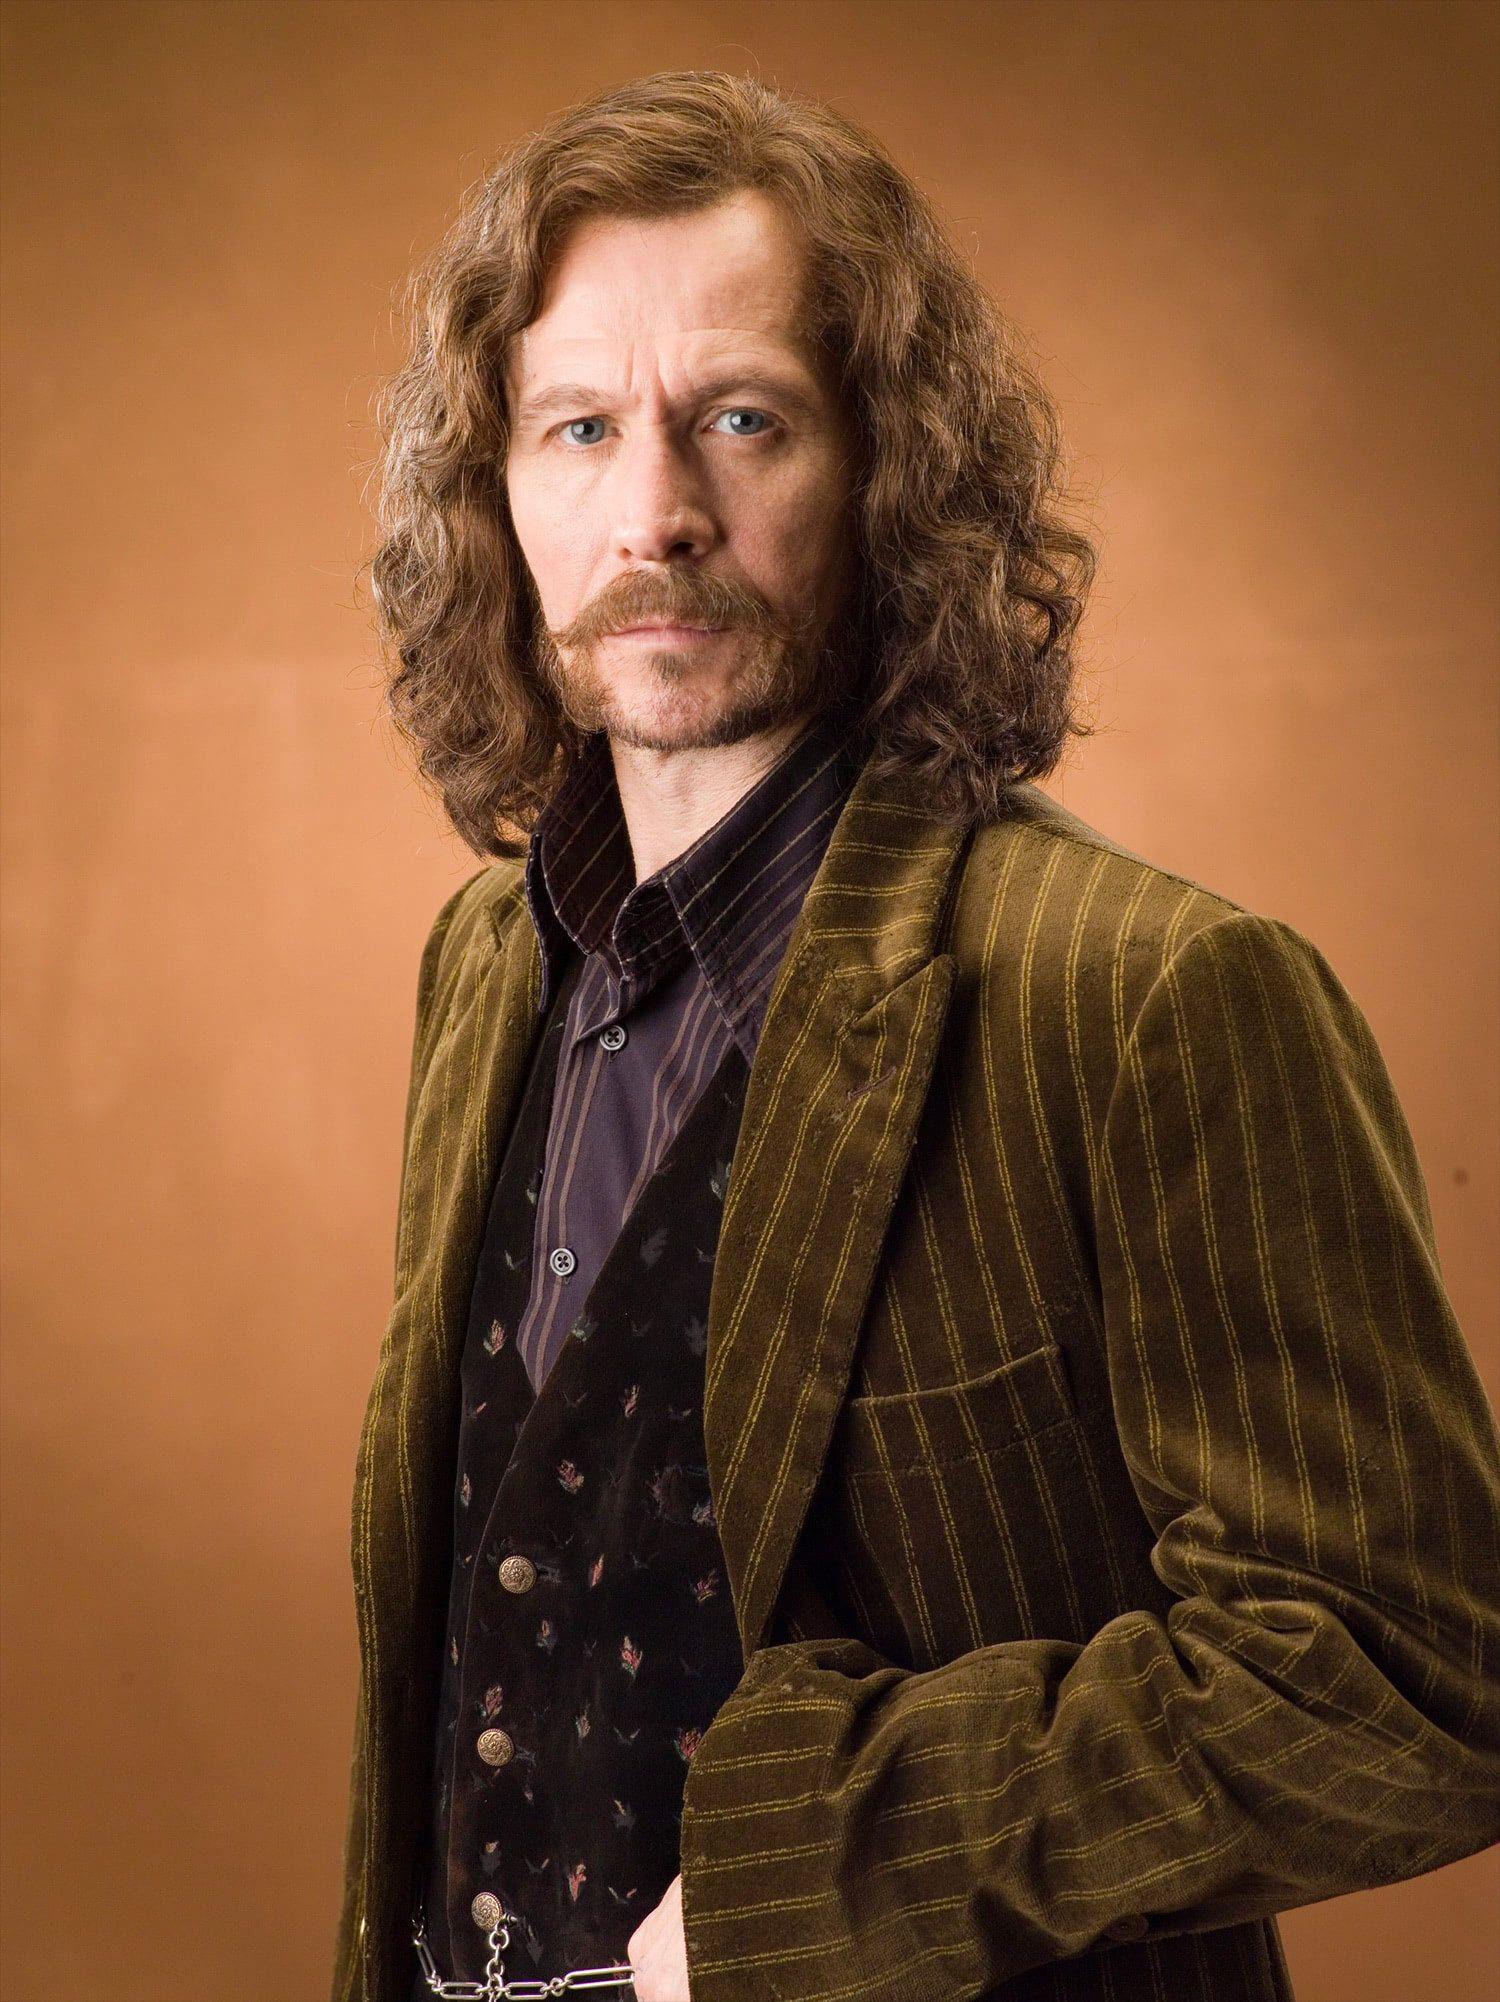 Sirius Black Portrait Ootp Sirius Black Gary Oldman Sirius Black Harry Potter Script